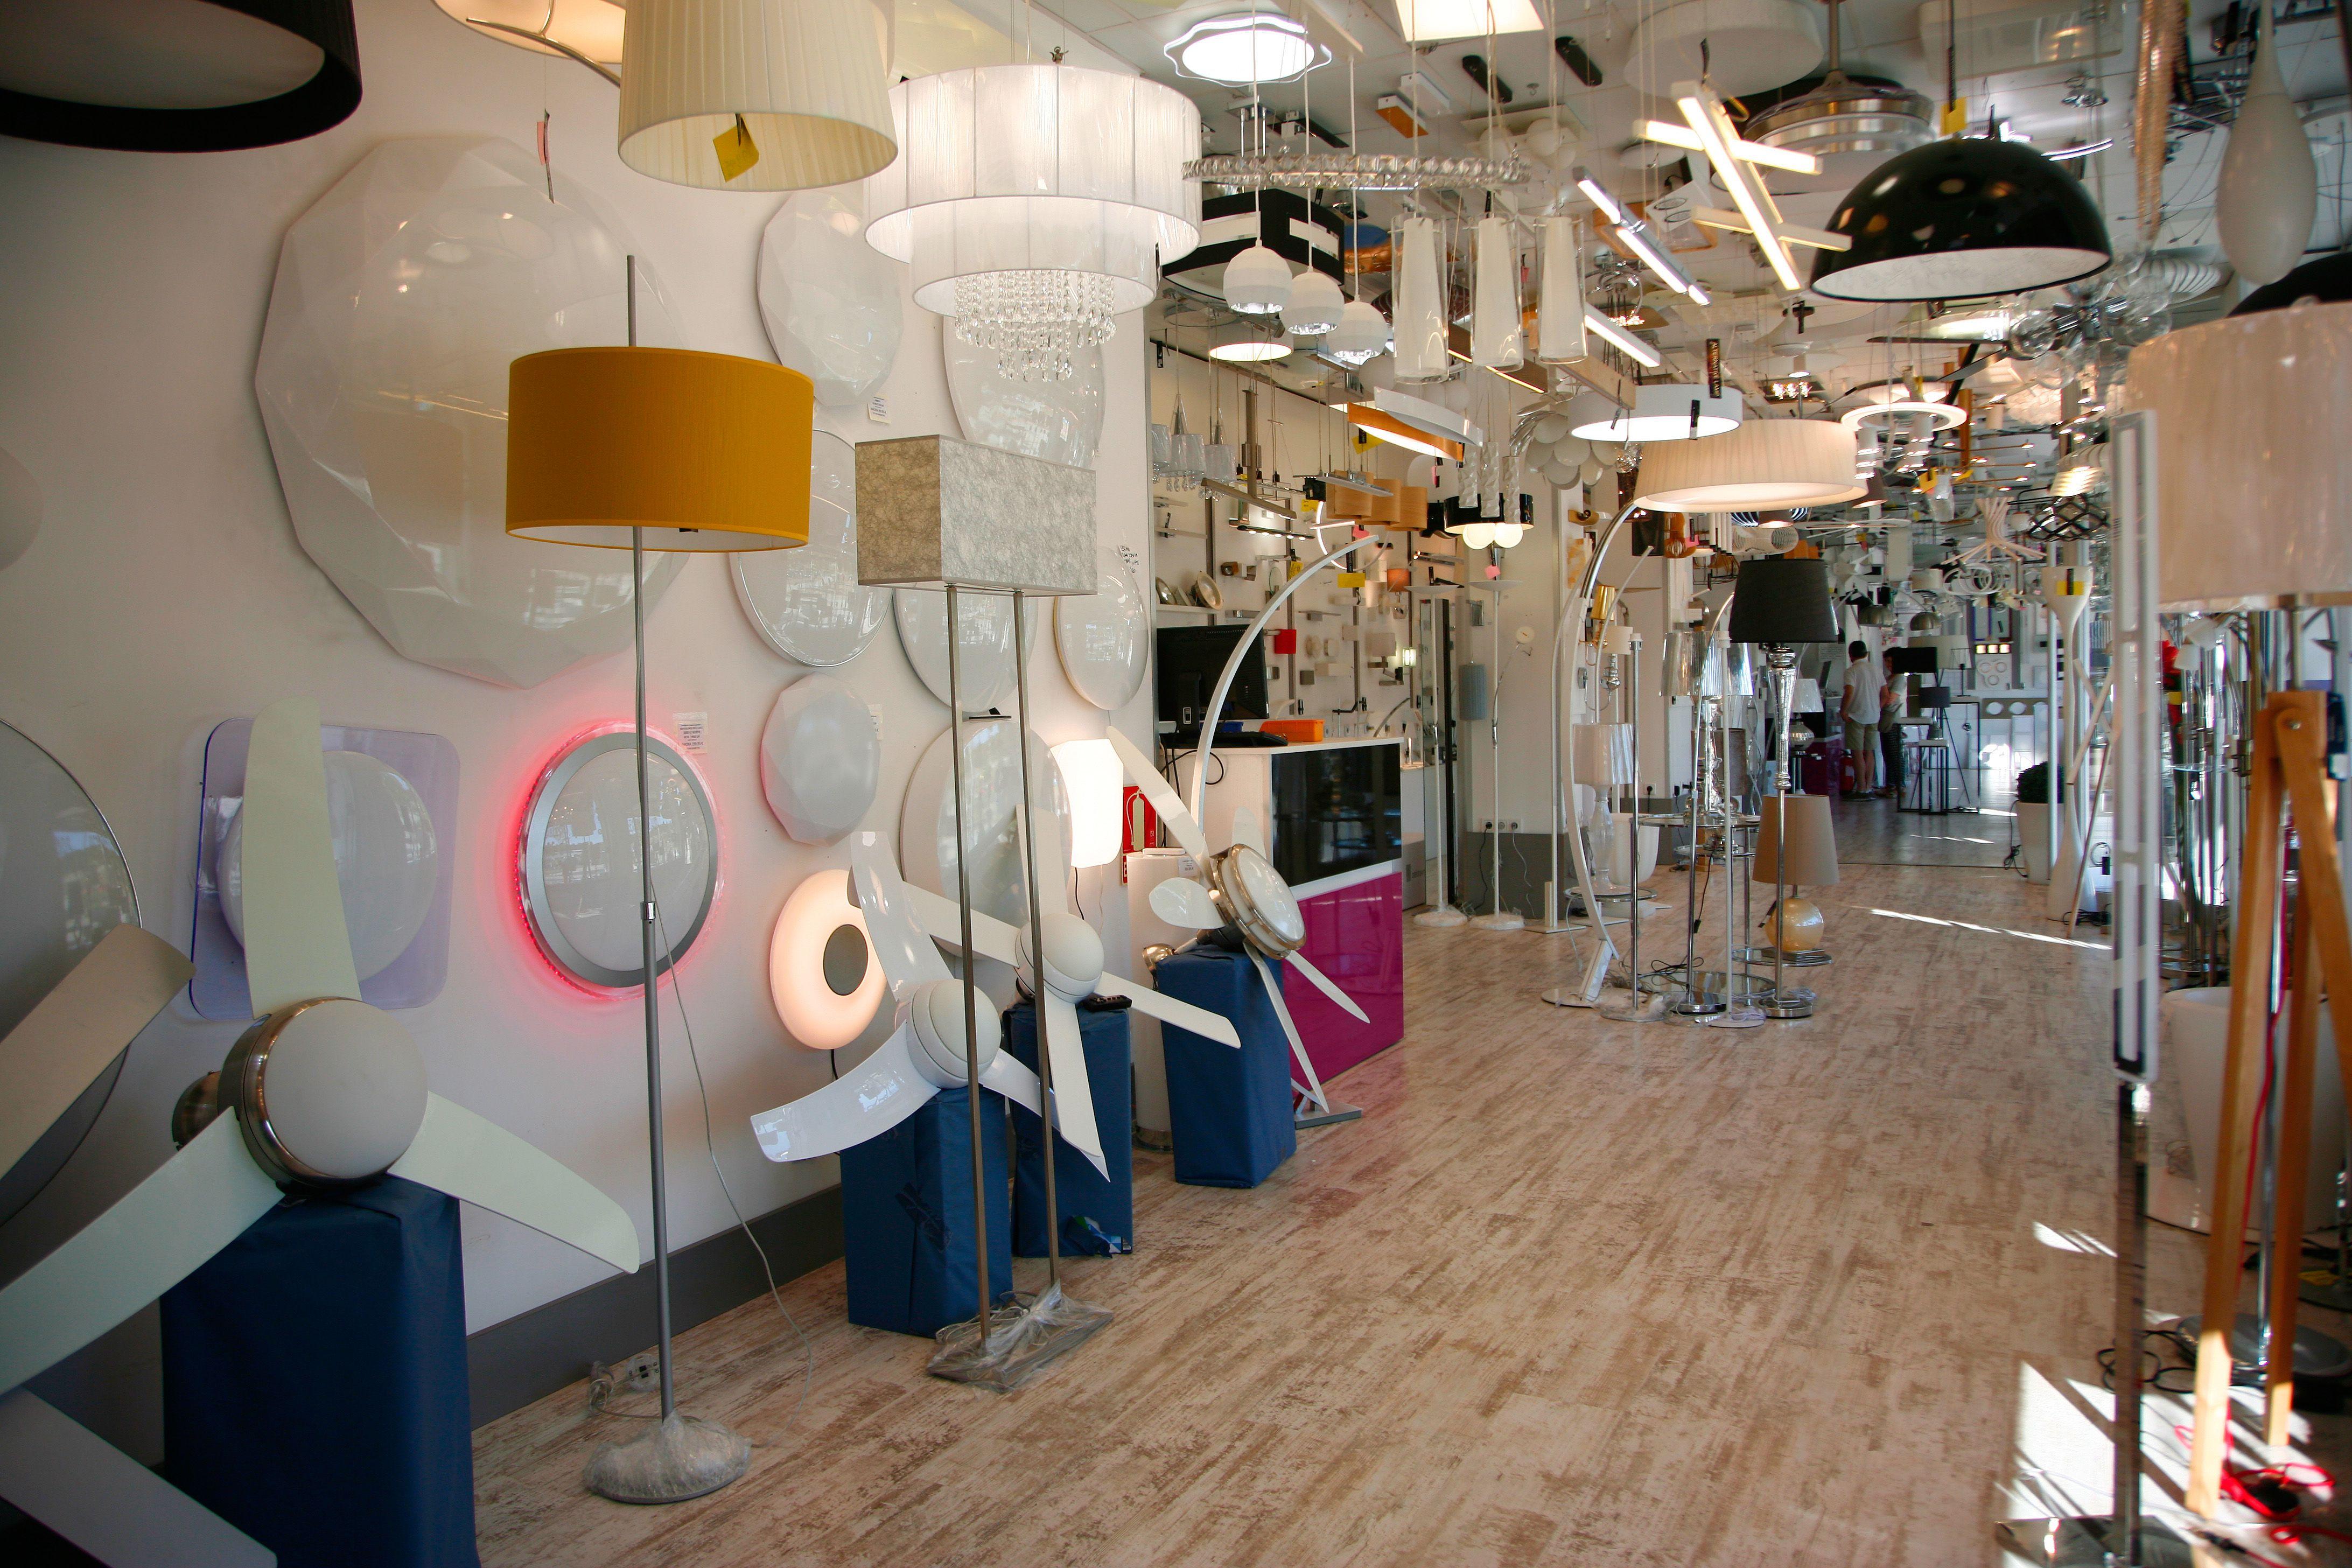 Proyectos de iluminación en Zaragoza